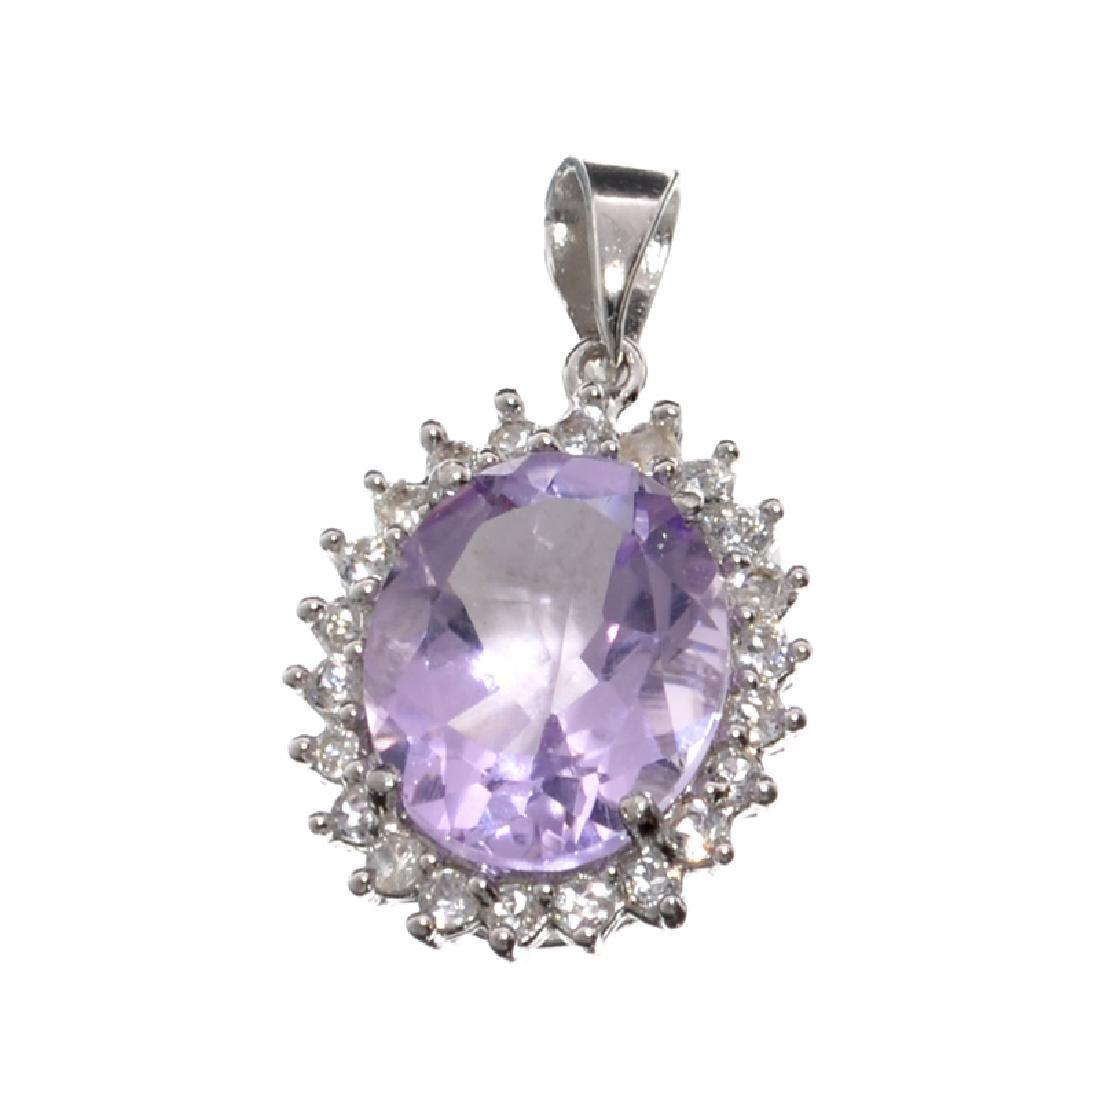 APP: 0.6k Fine Jewelry 3.40CT Purple Amethyst And White